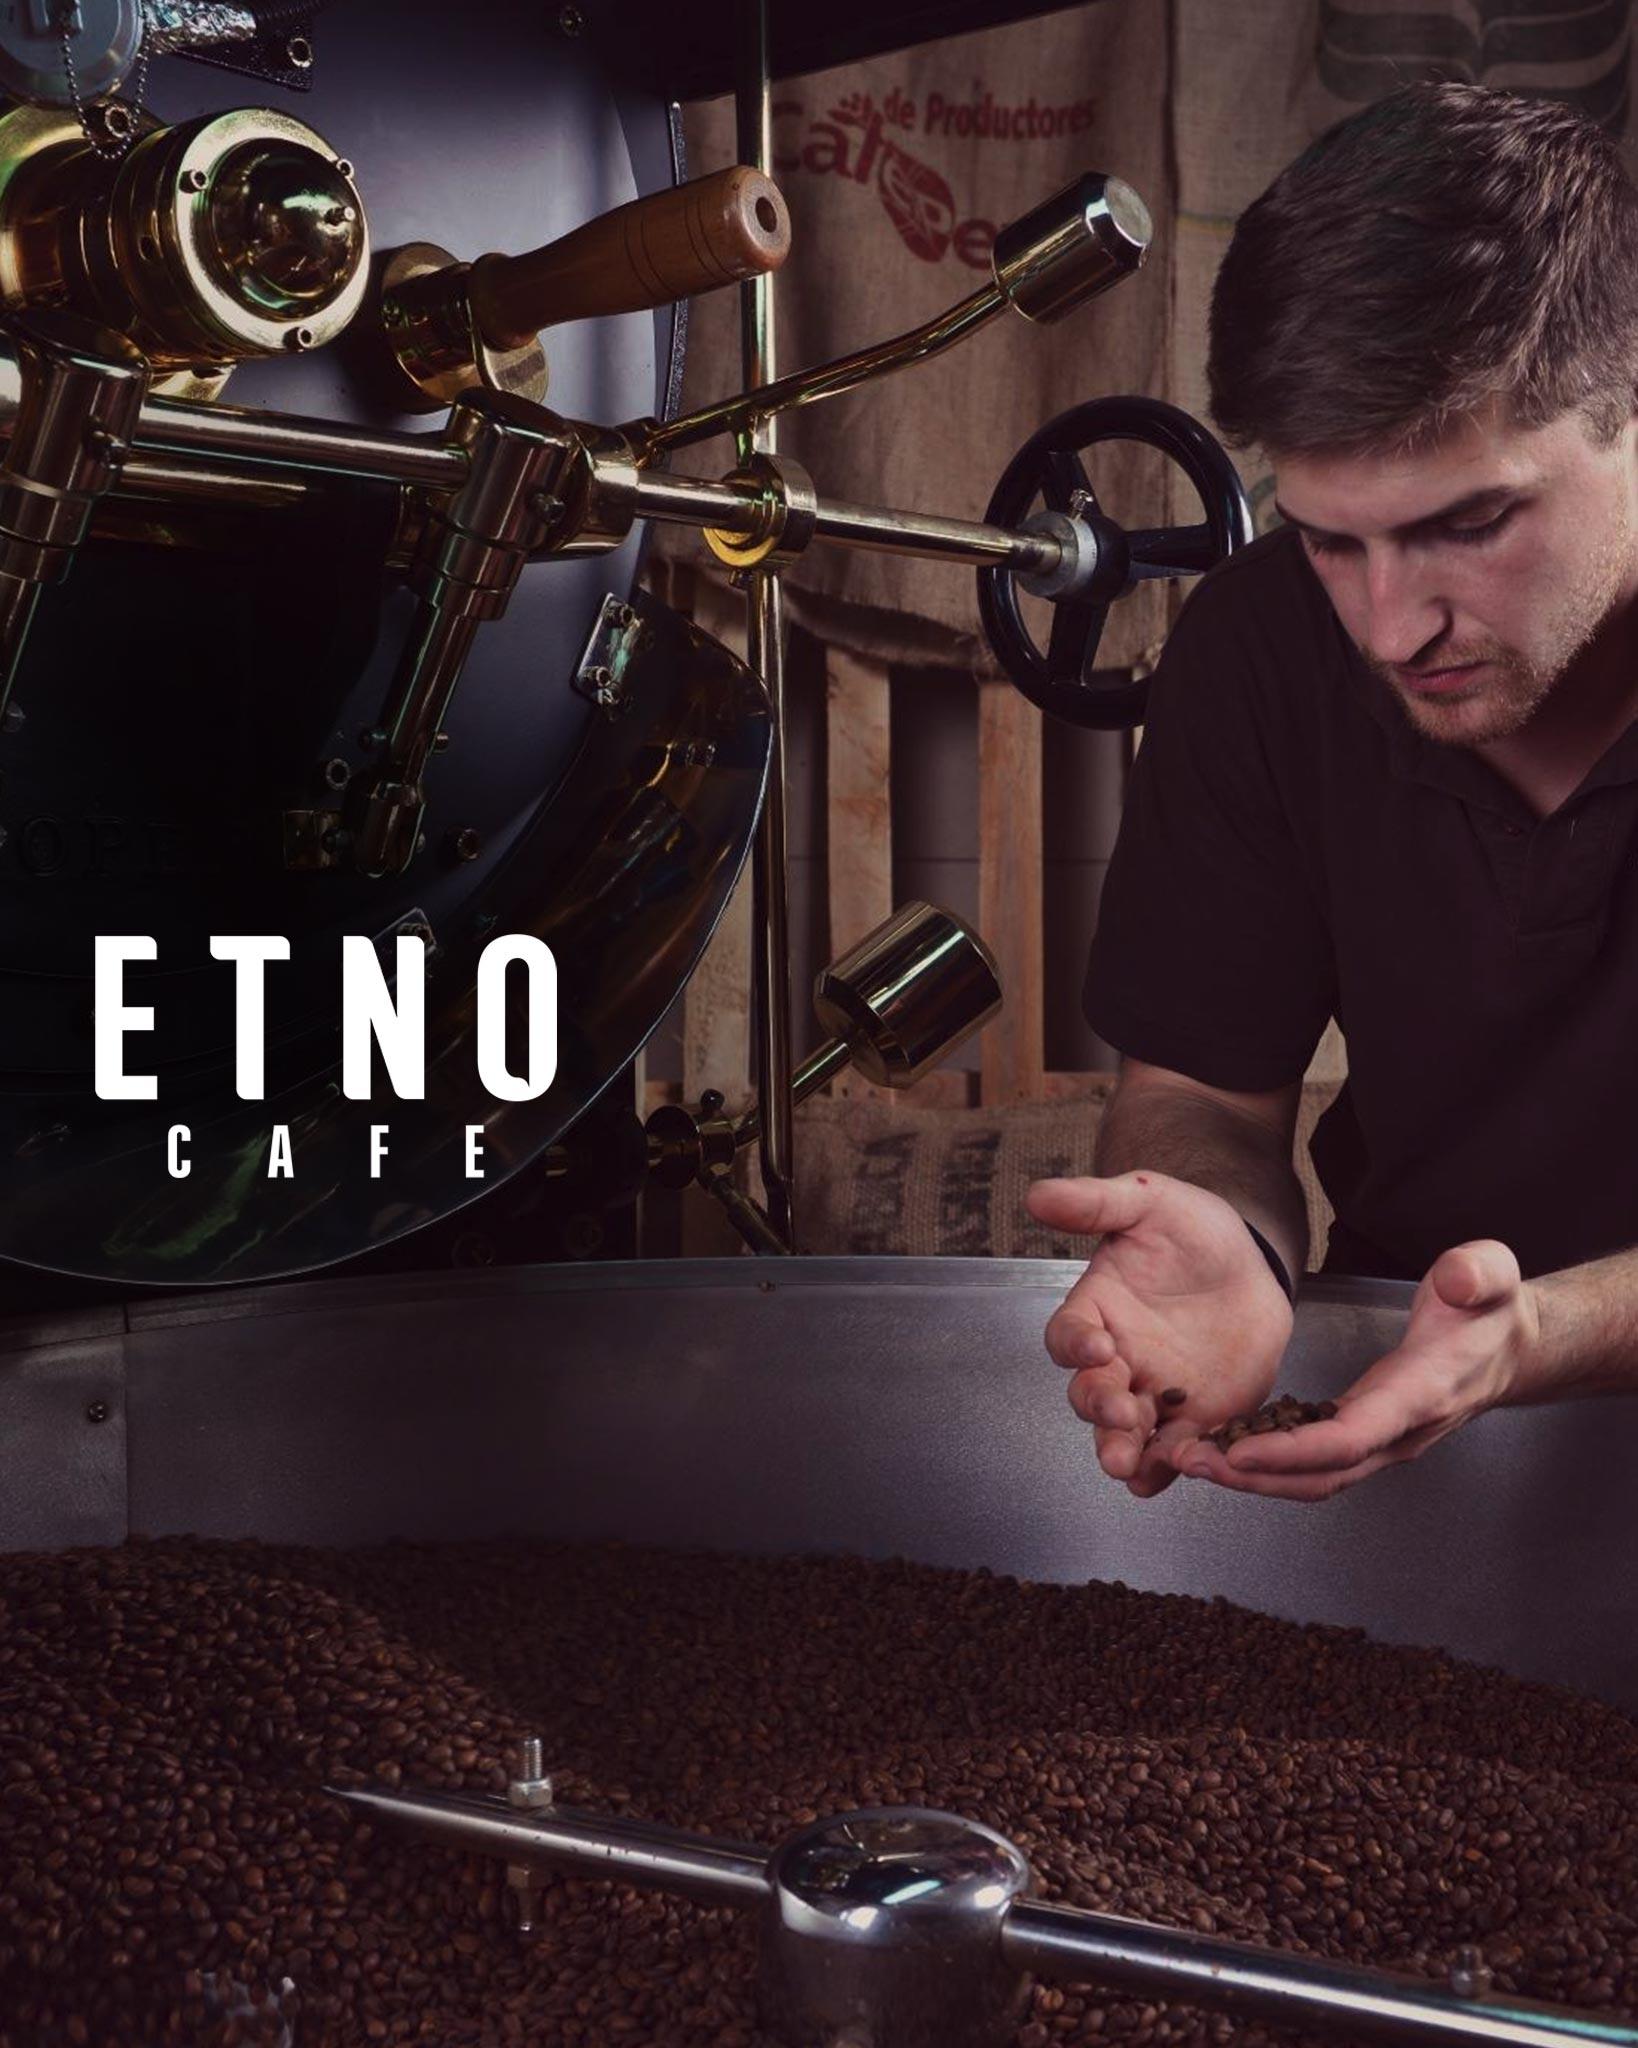 Etno Cafe - Polska palarnia kawy